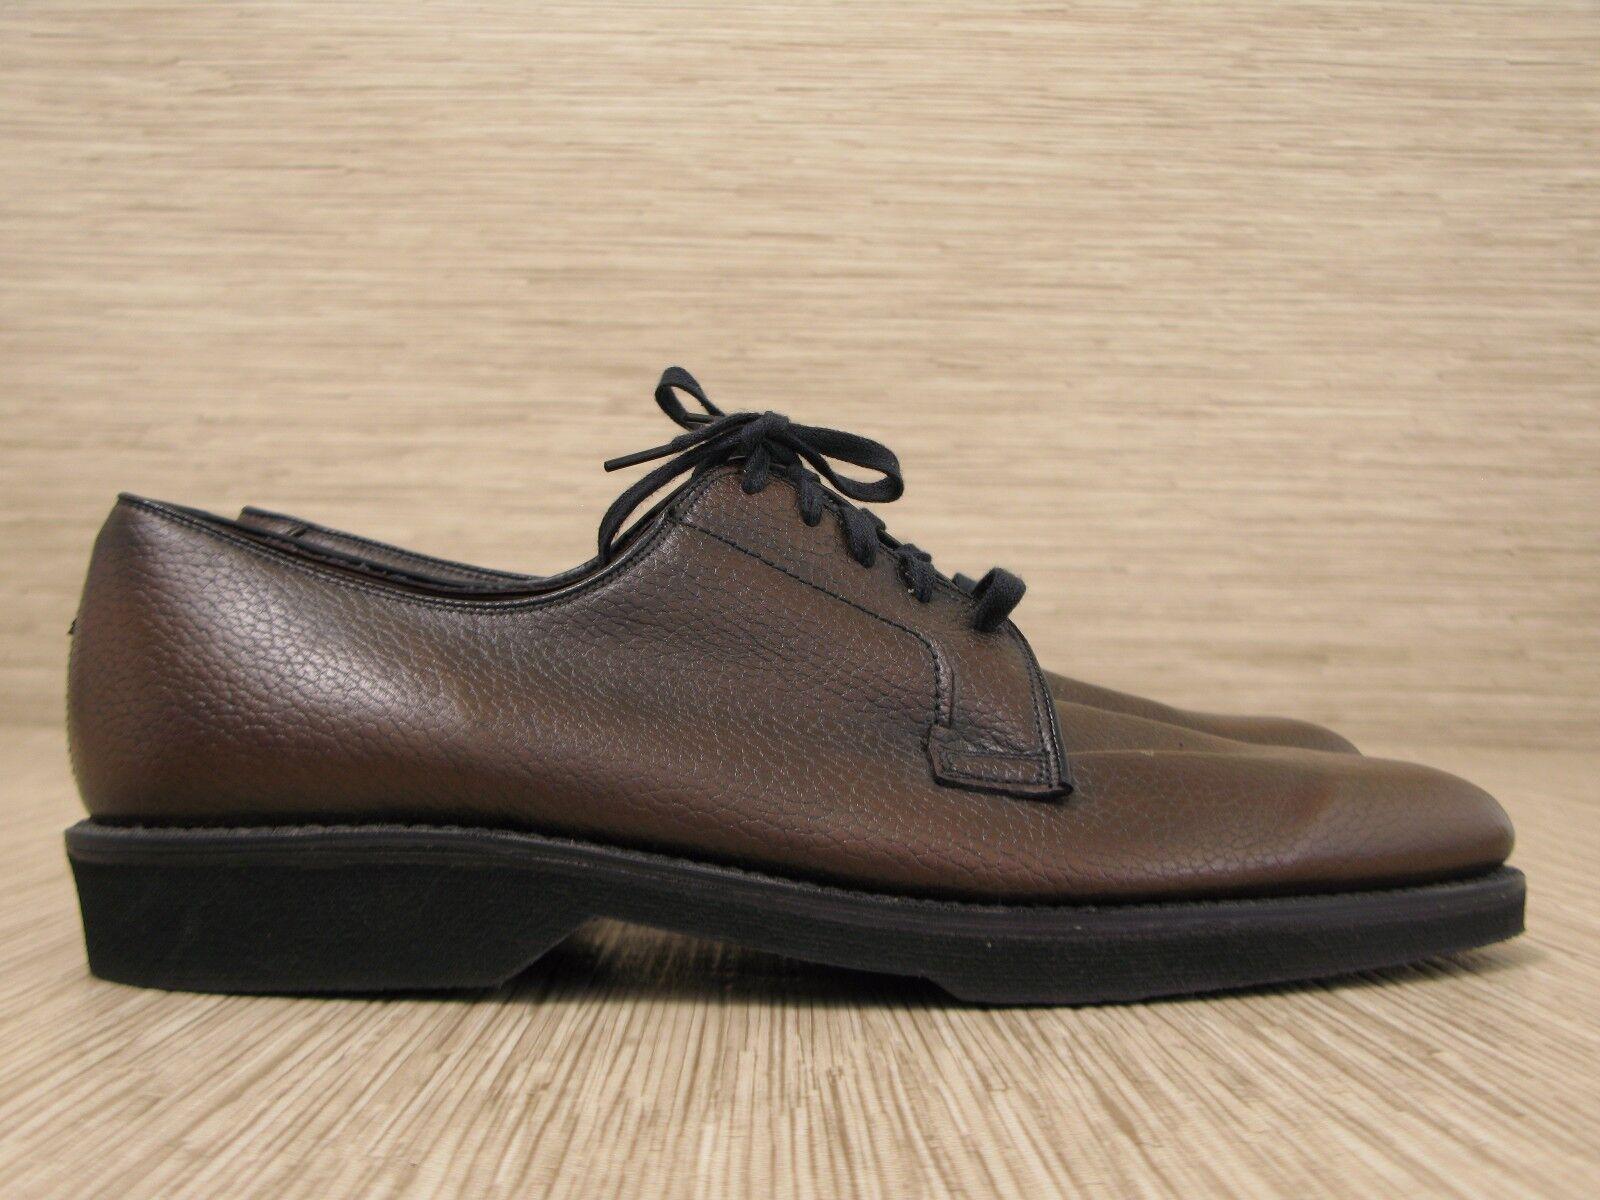 economico online Stacy Stacy Stacy Adams Marrone Leather scarpe Uomo Dimensione US 12 D Lace Up Oxfords Crush-N-Crepe  prezzi bassi